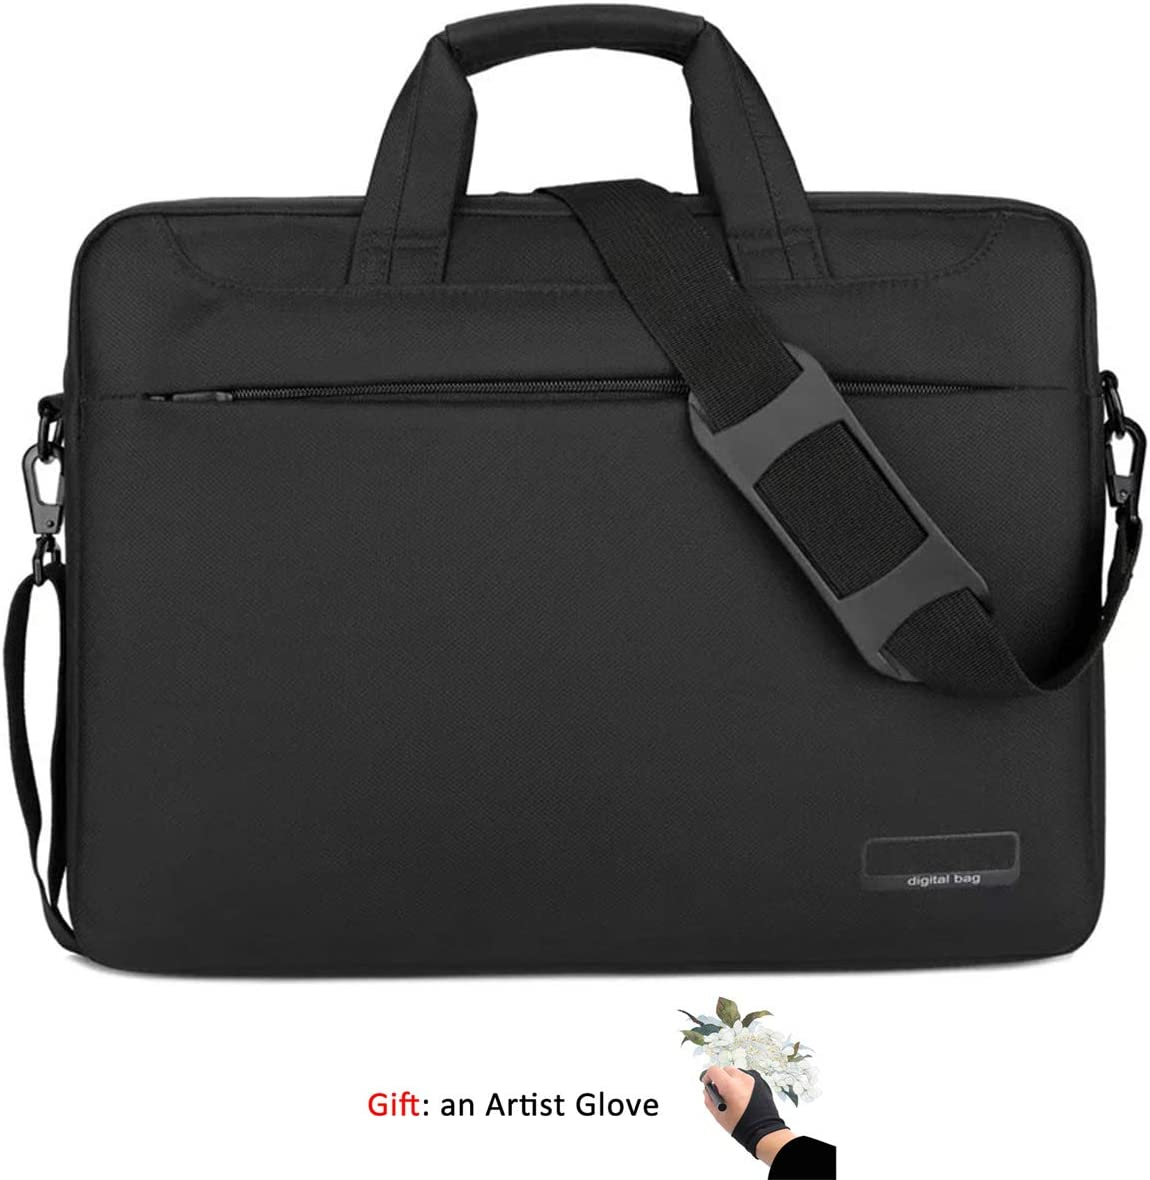 Cintiq Pro 16 Funda de transporte para tablet Wacom Cintiq 16 Intuos Pro PTH860 impermeable con guante de artista